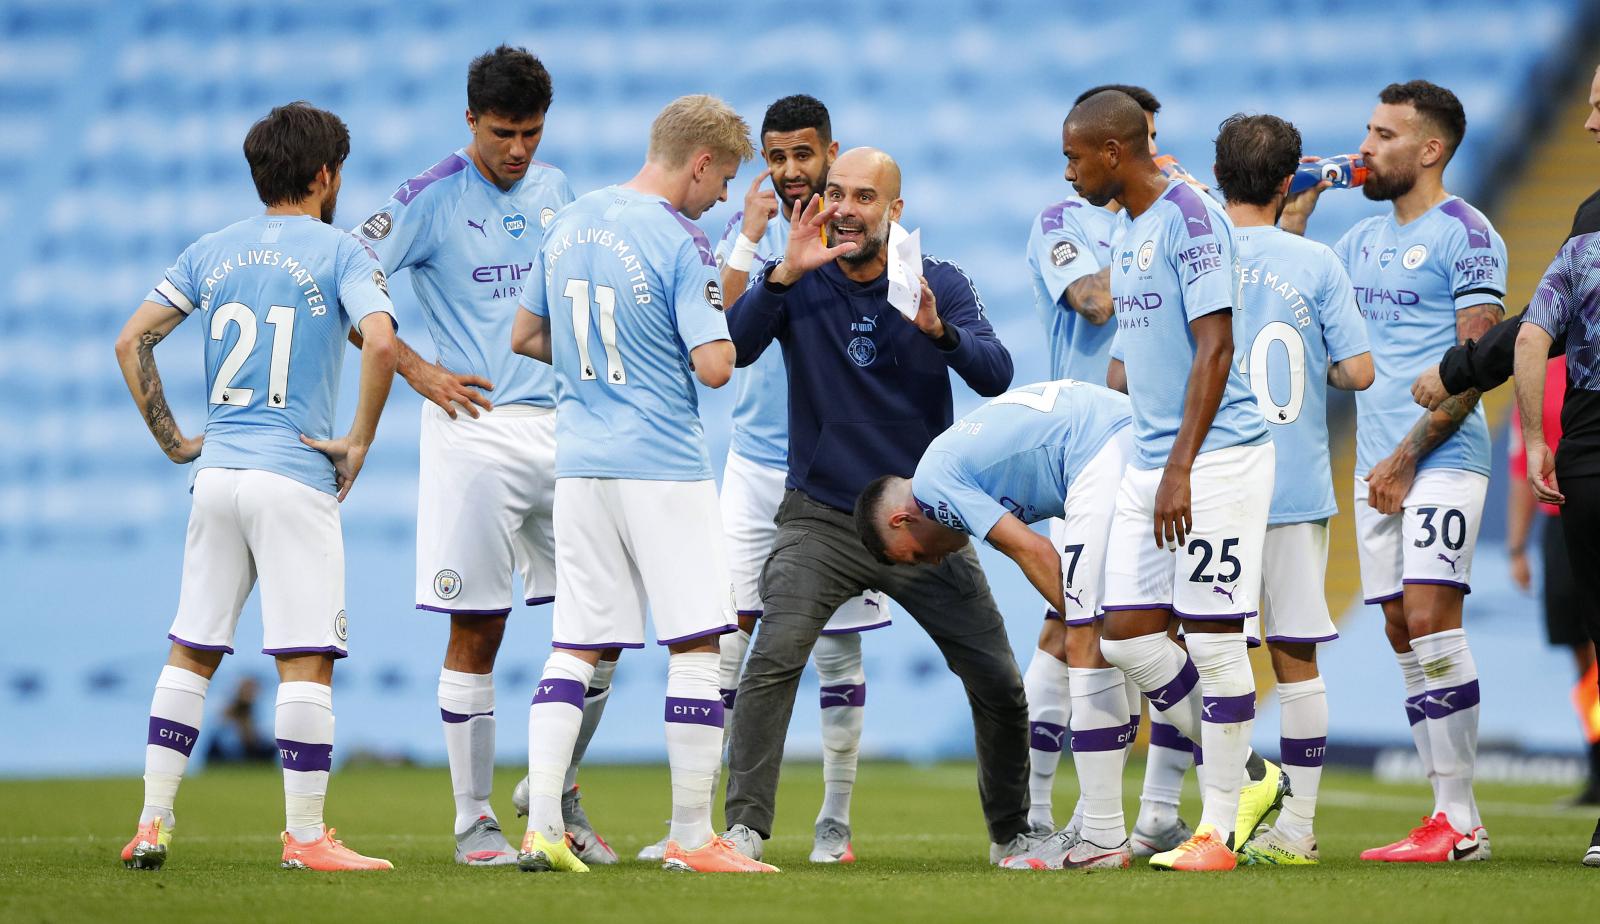 «Саутгемптон» - «Манчестер Сити»: прогноз на матч чемпионата Англии